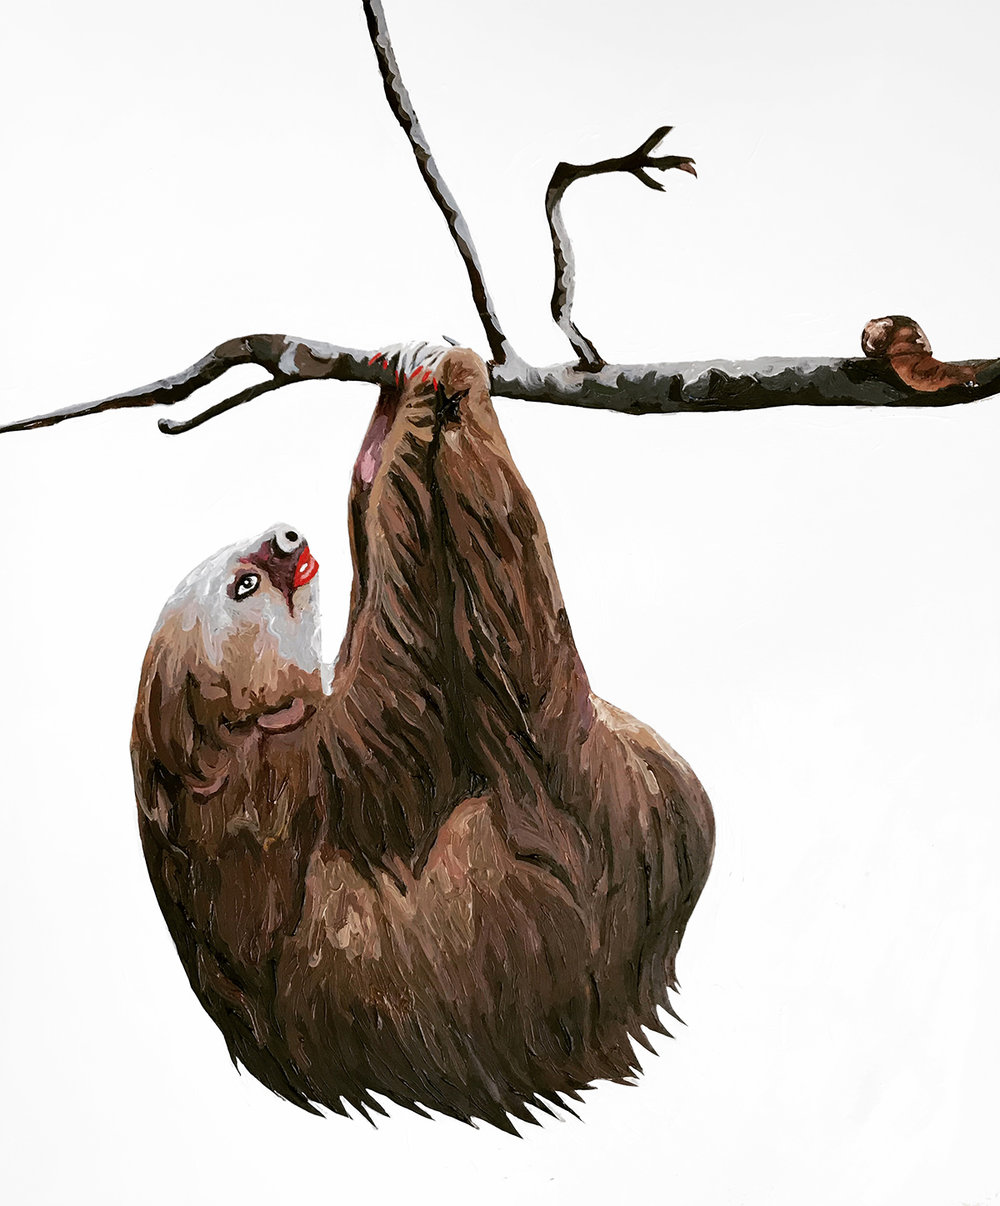 sloth copy.jpg